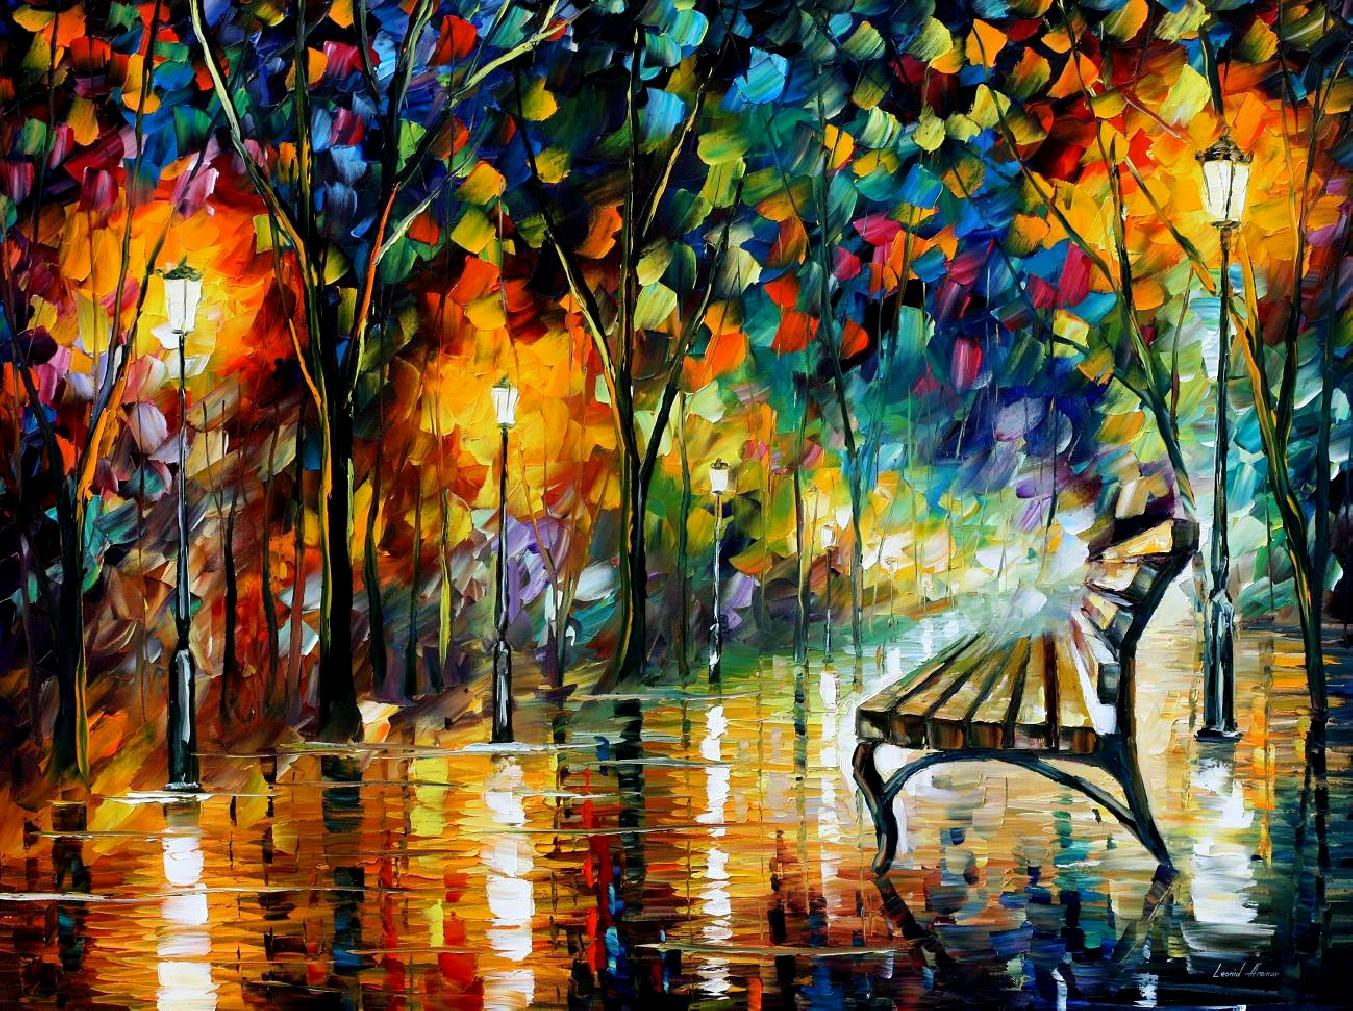 Lonely Paintings - Original